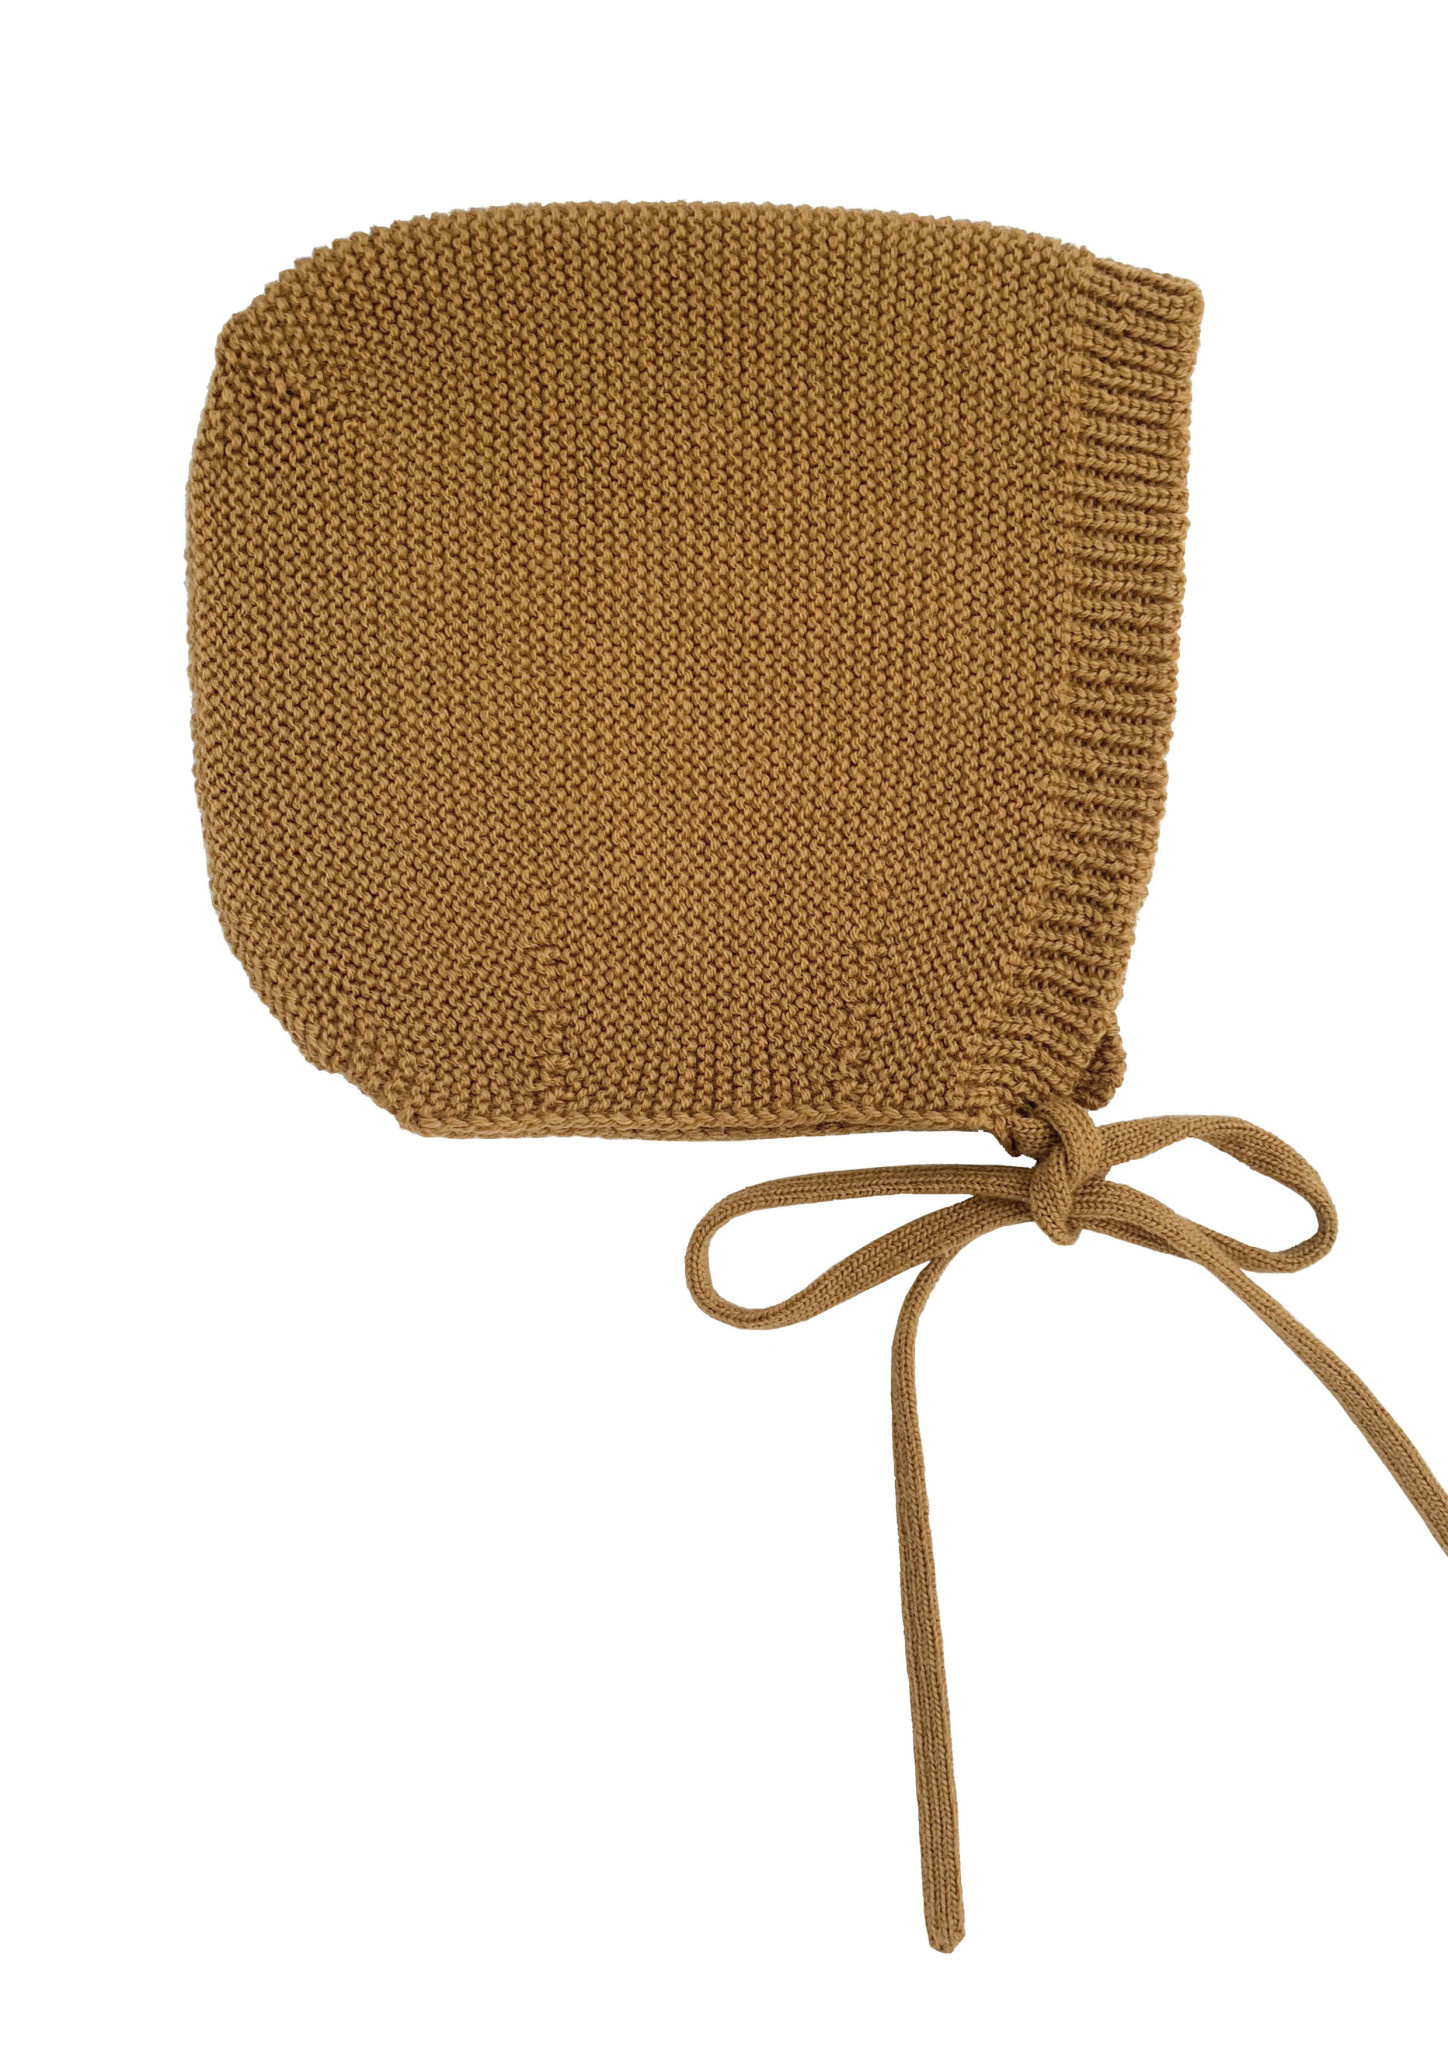 Bonnet dolly mustard-1